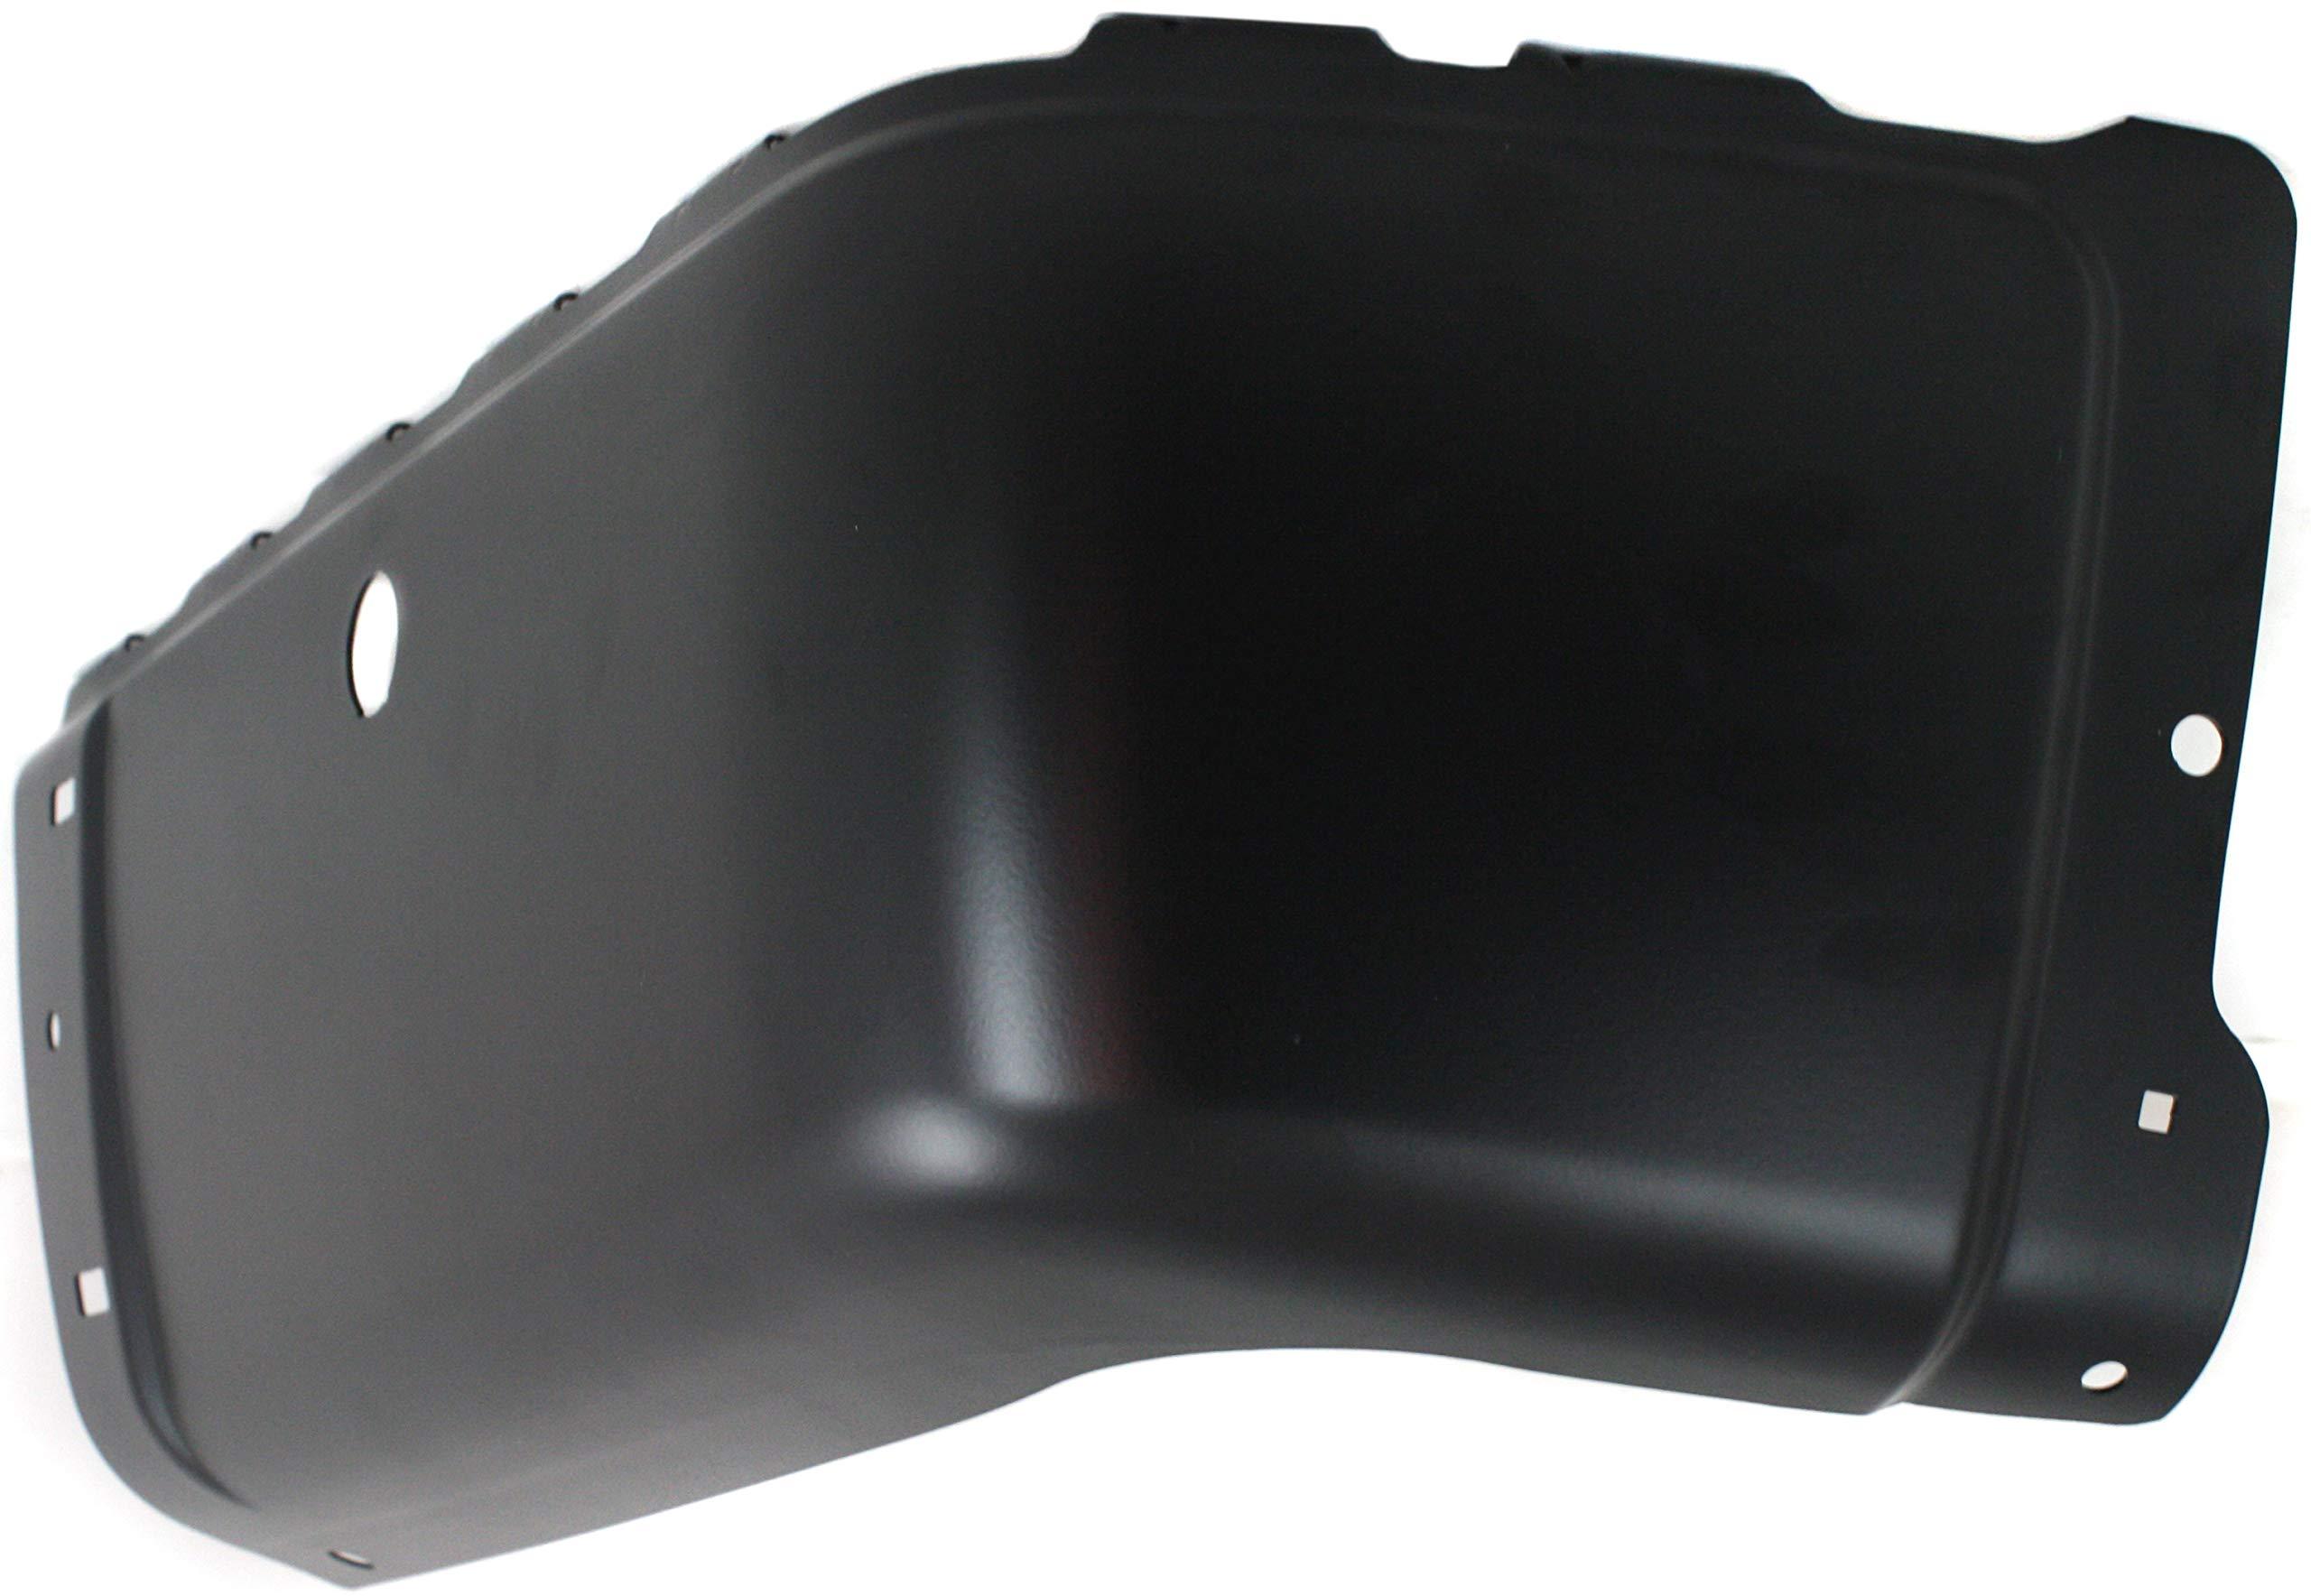 Covercraft Front End Mask: 2007-13 Fits GMC Yukon /& Yukon XL Yukon Denali /& XL Hybrid MM43161 MM Series